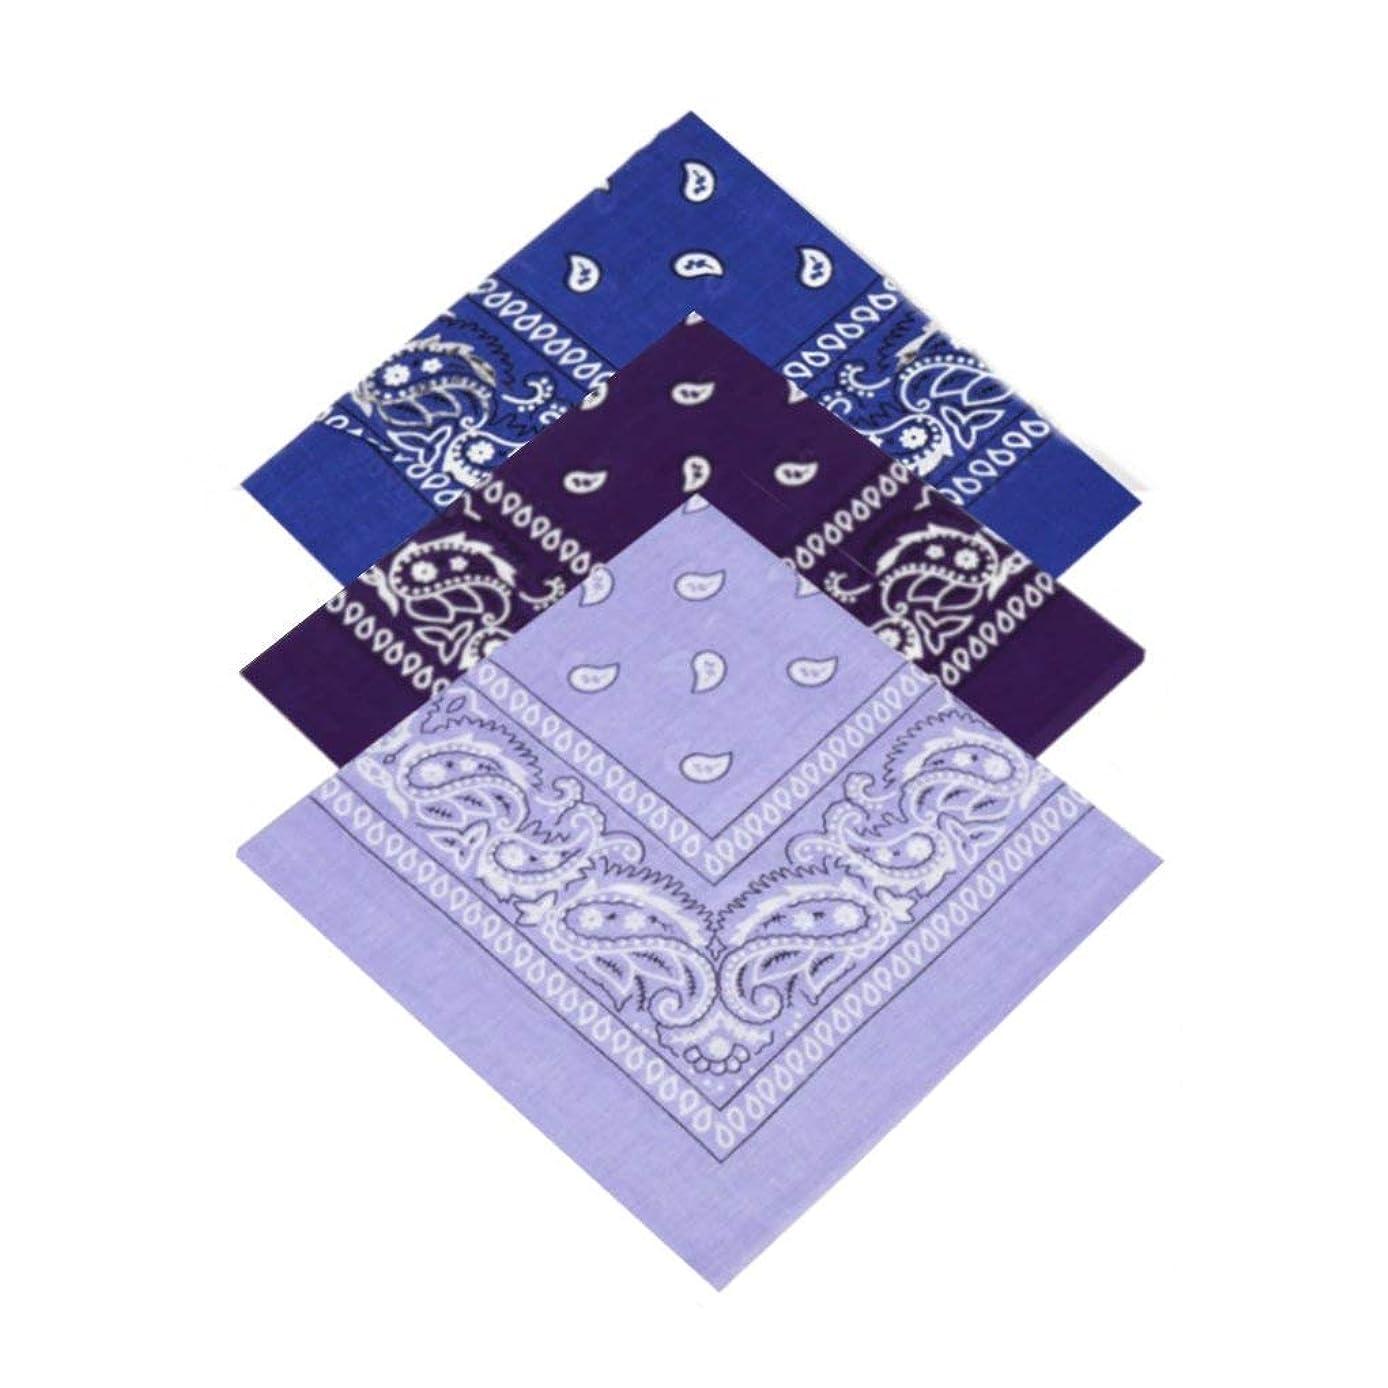 GTHYUUI Pack of 3 X Paisley Bandana Headbands for Women, Girls,Men & Boys 100% Cotton Bandana Headscarf/Neck Scarf/Neckerchief / Handkerchief/Head Tie (Royal Blue,Purple,Lilac)